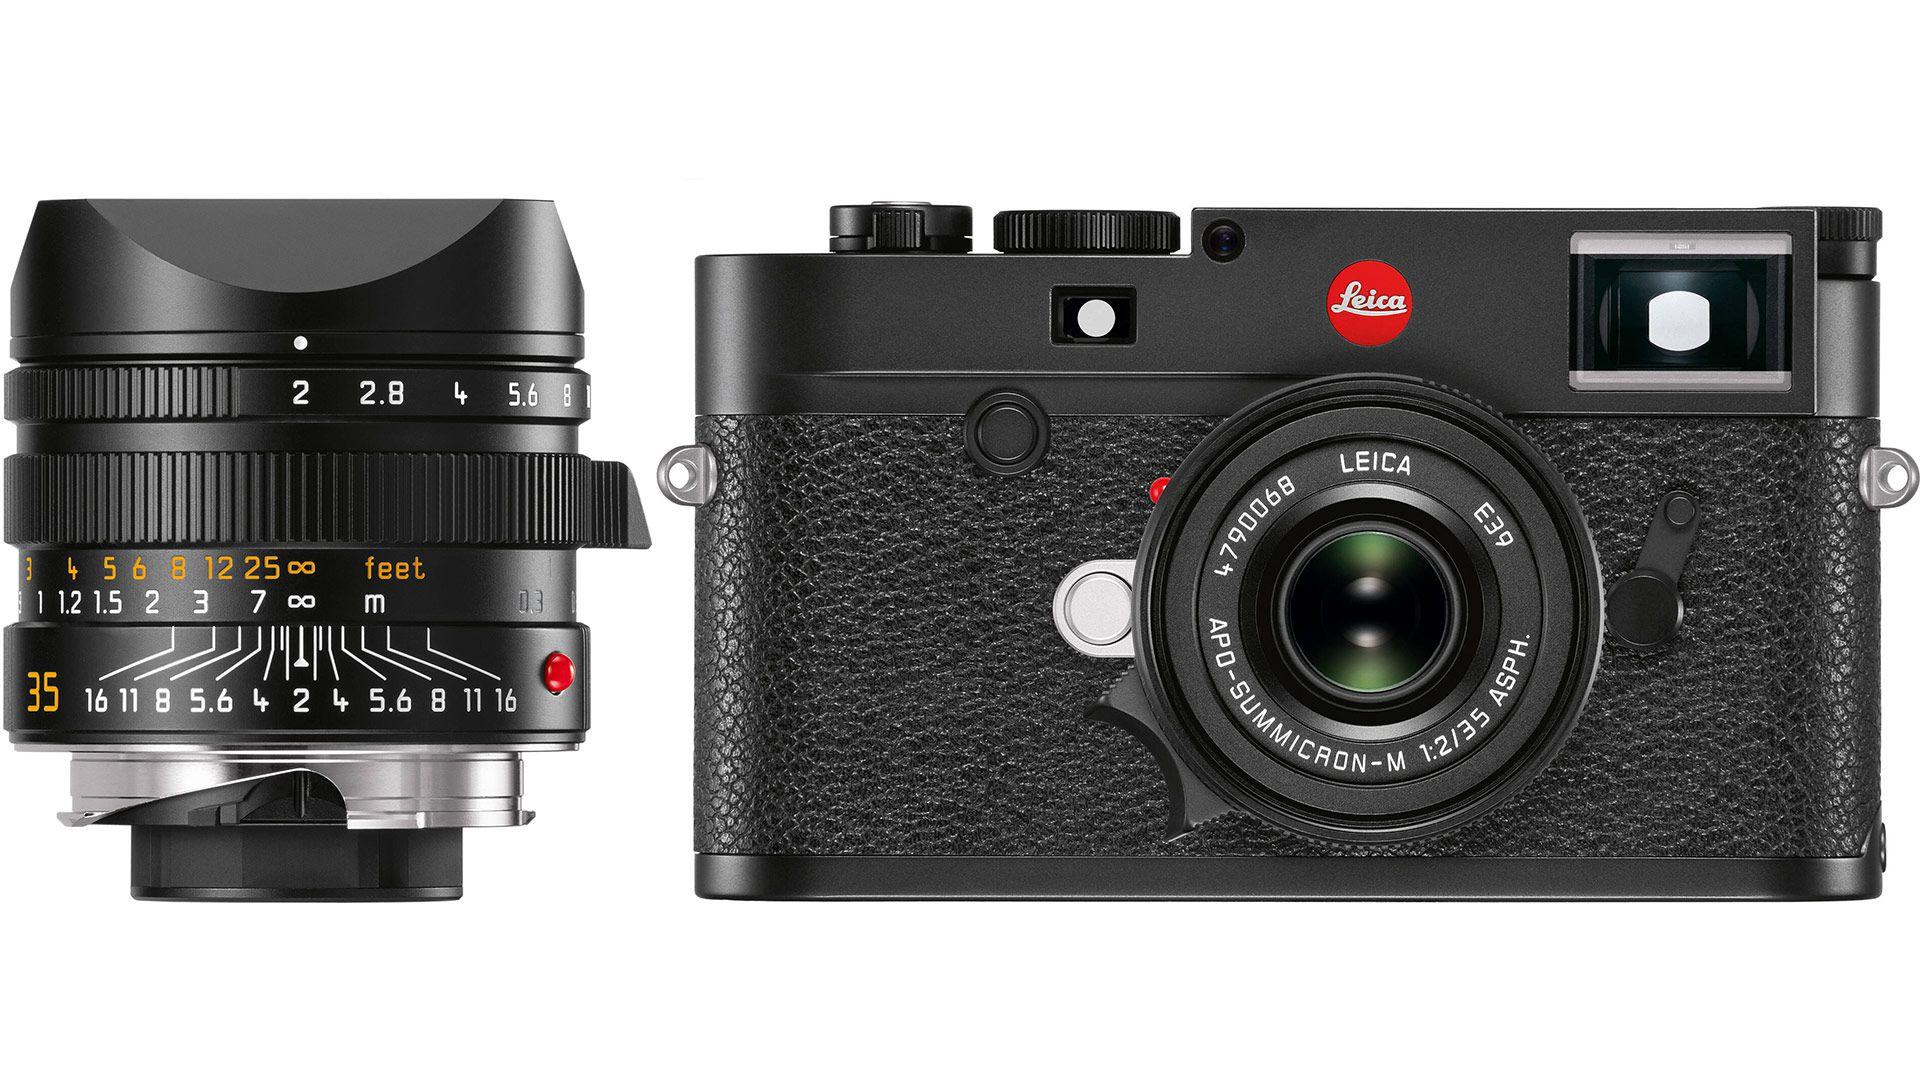 Объектив Leica APO-Summicron-M 35mm f/2 Asph. с фотоаппаратом Leica